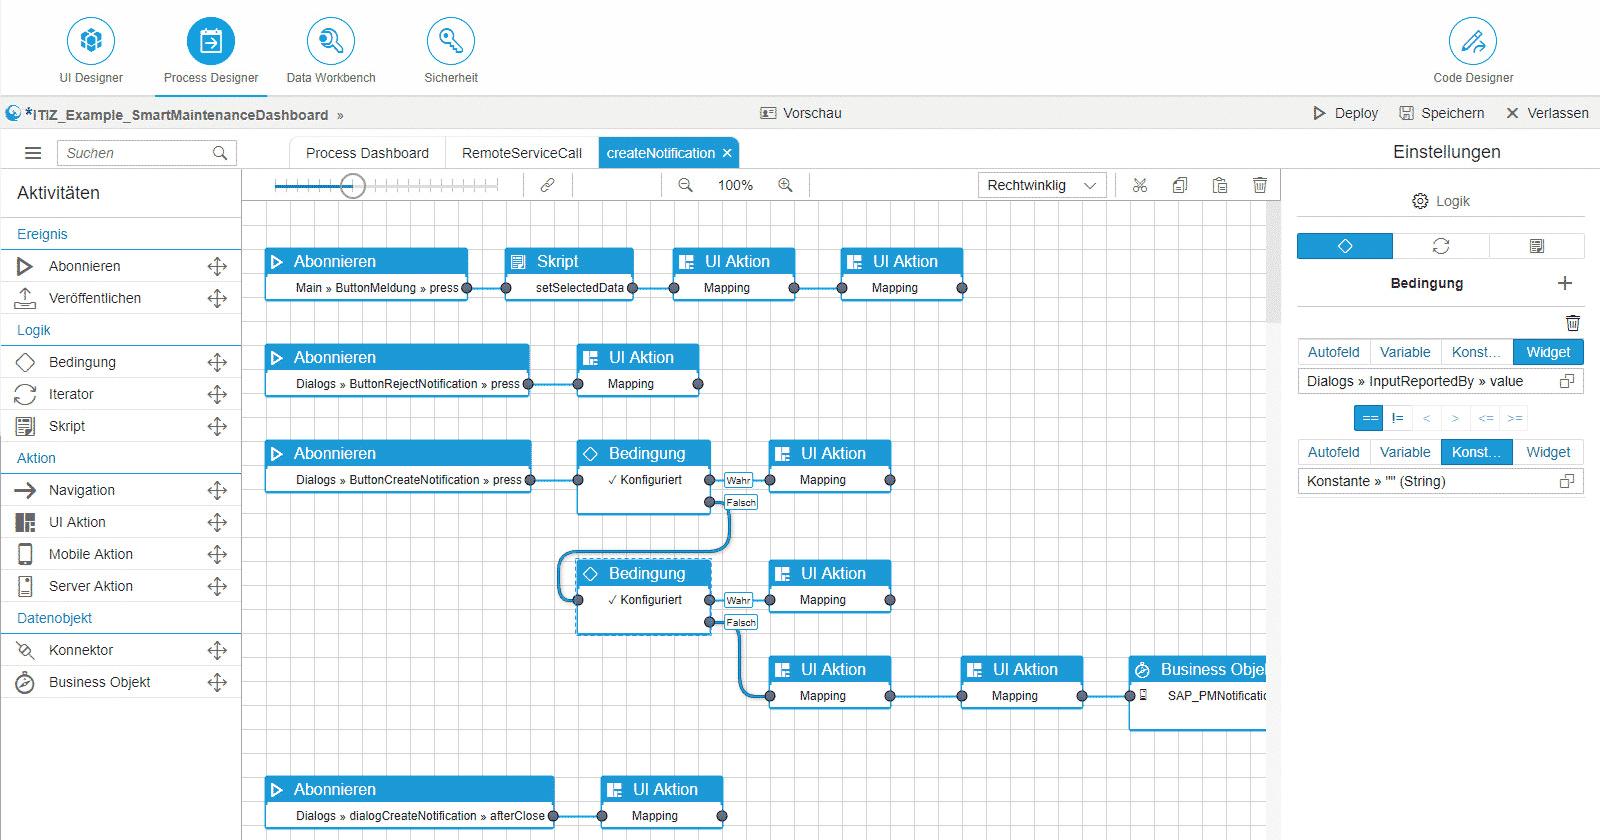 Simplifier UI